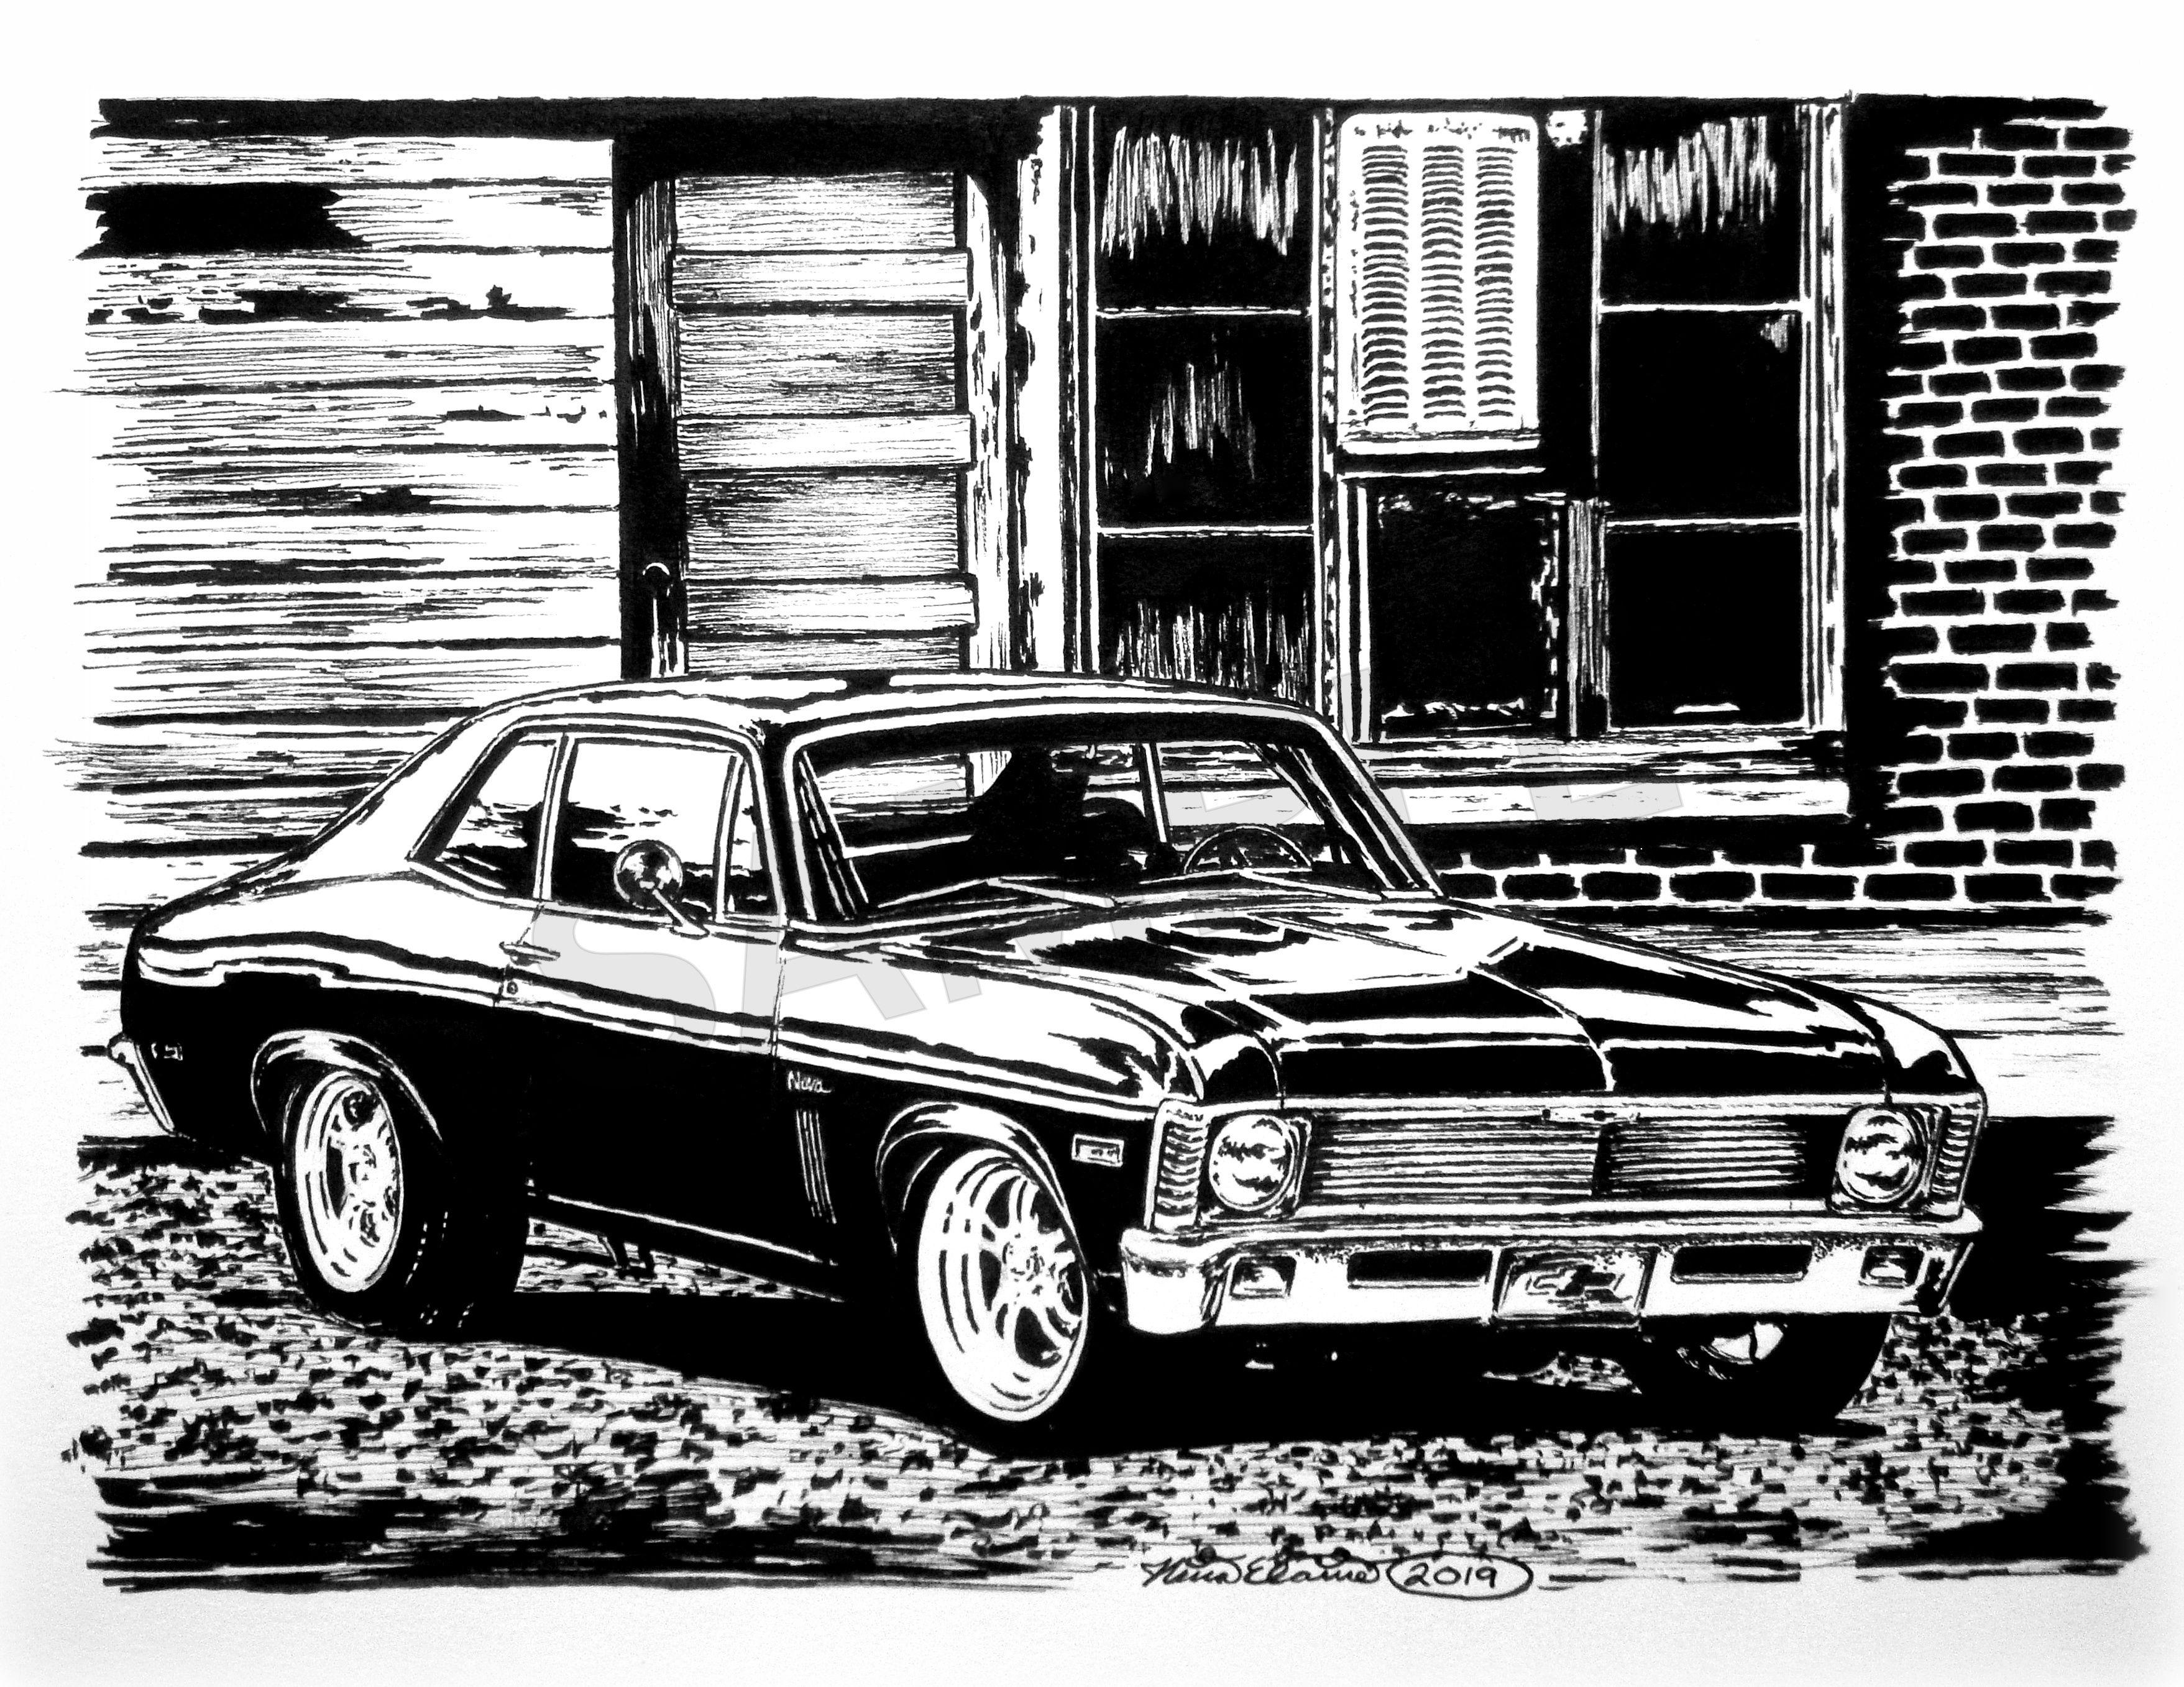 68 72 X Body Nova Ink Artwork By N E Thompson Art Print From